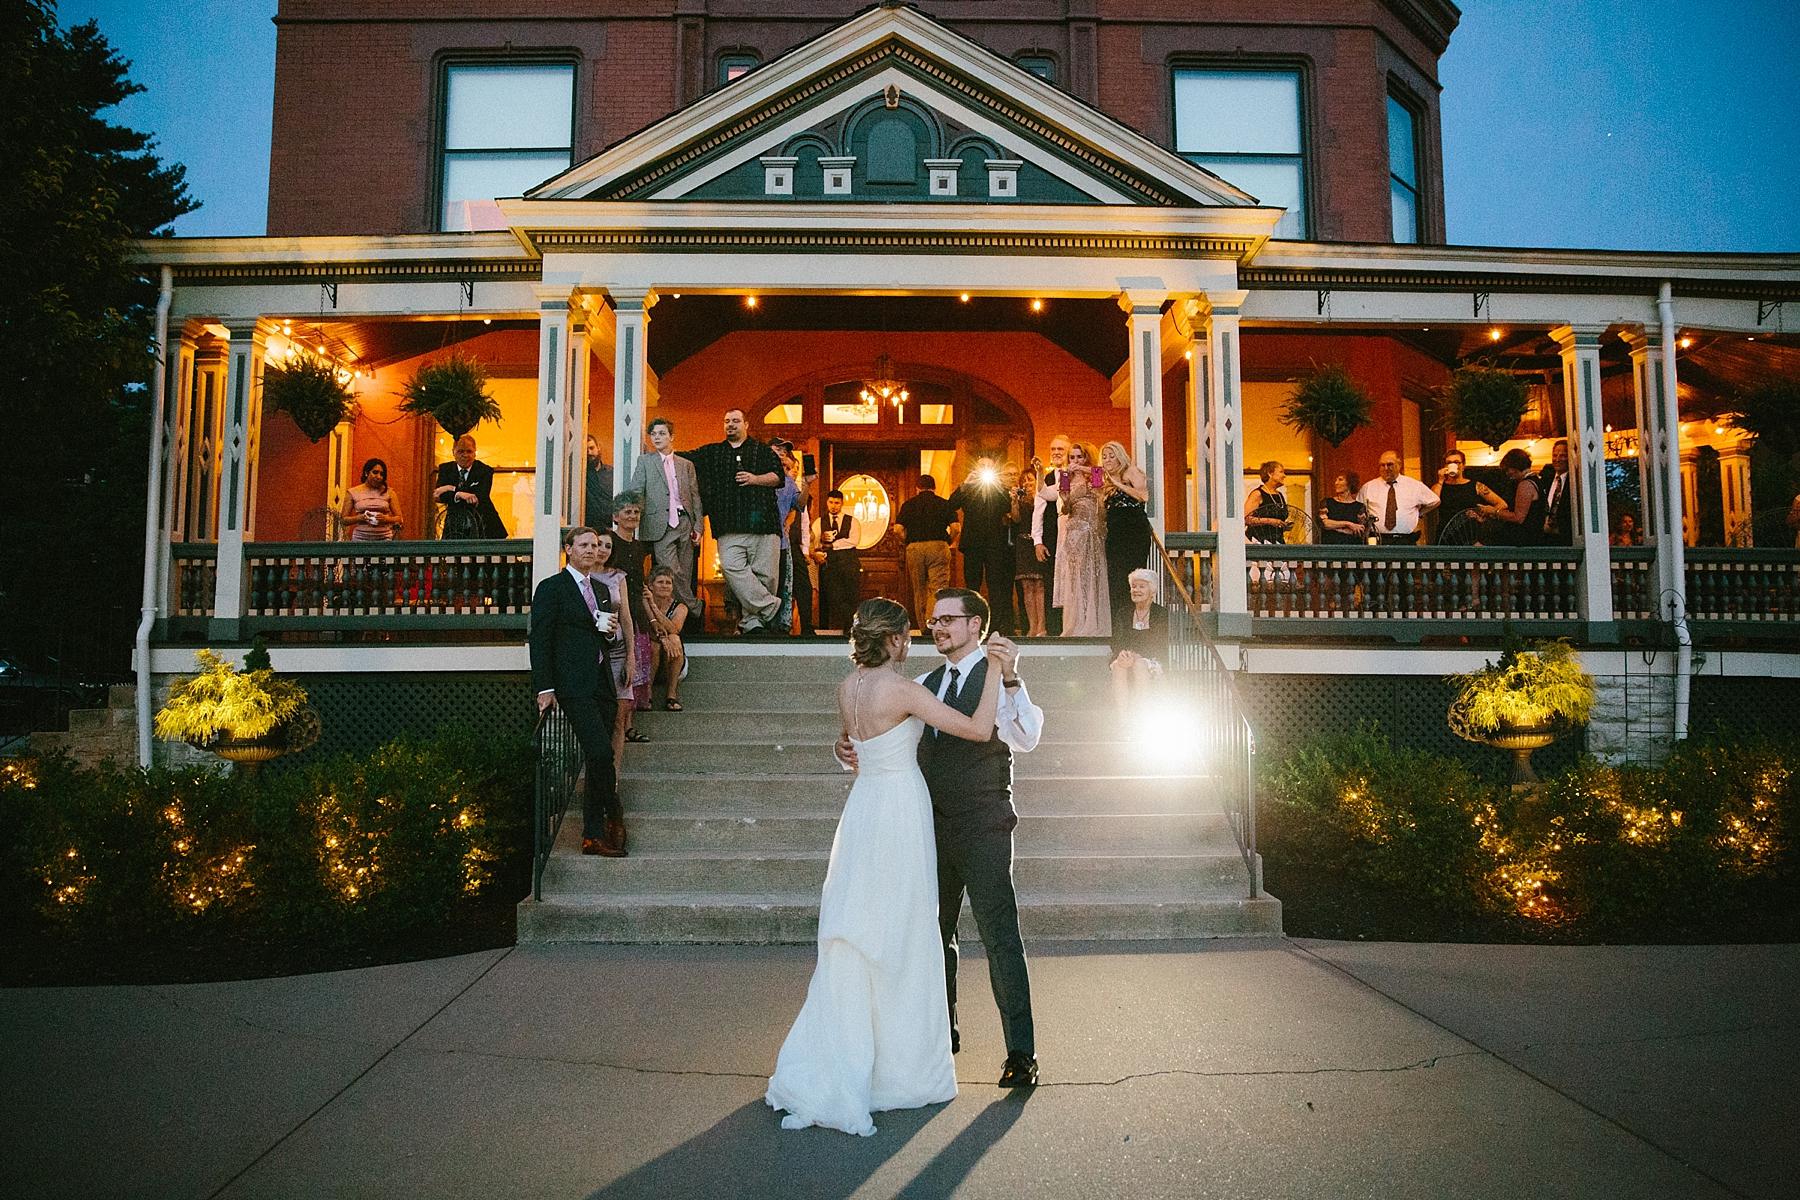 farm-wedding-engagement-session-destination-intimate_0080.jpg